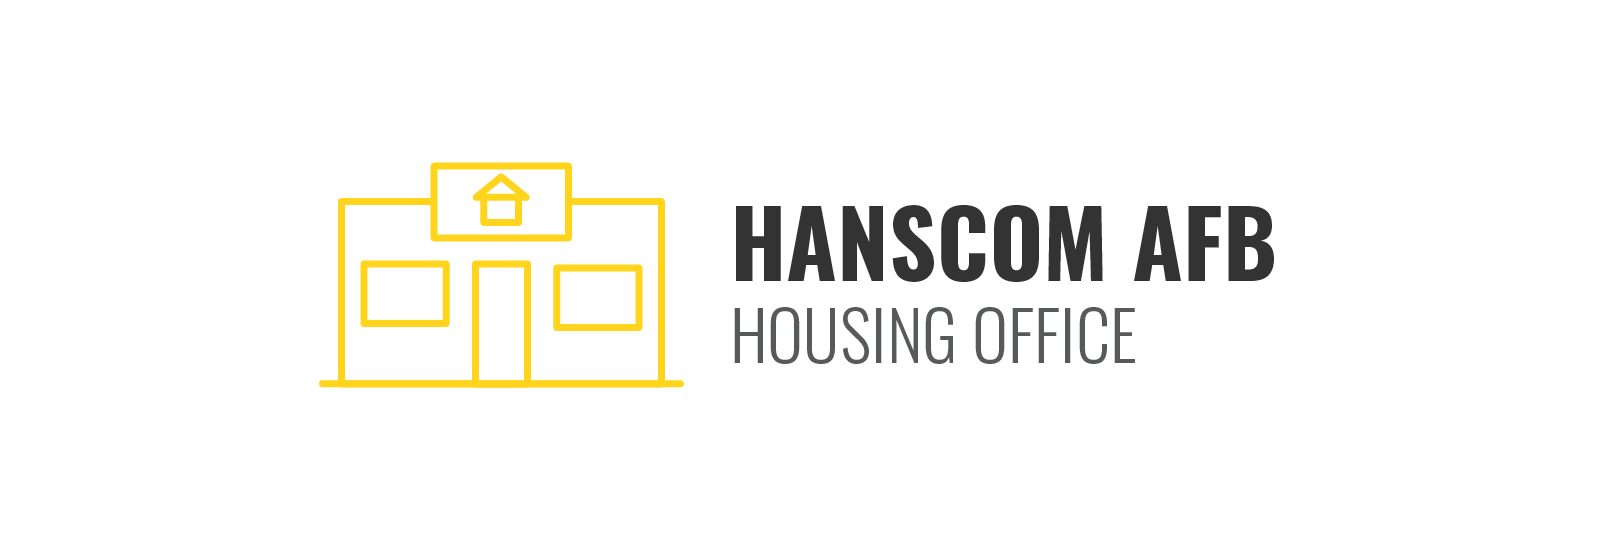 Hanscom AFB Housing Office